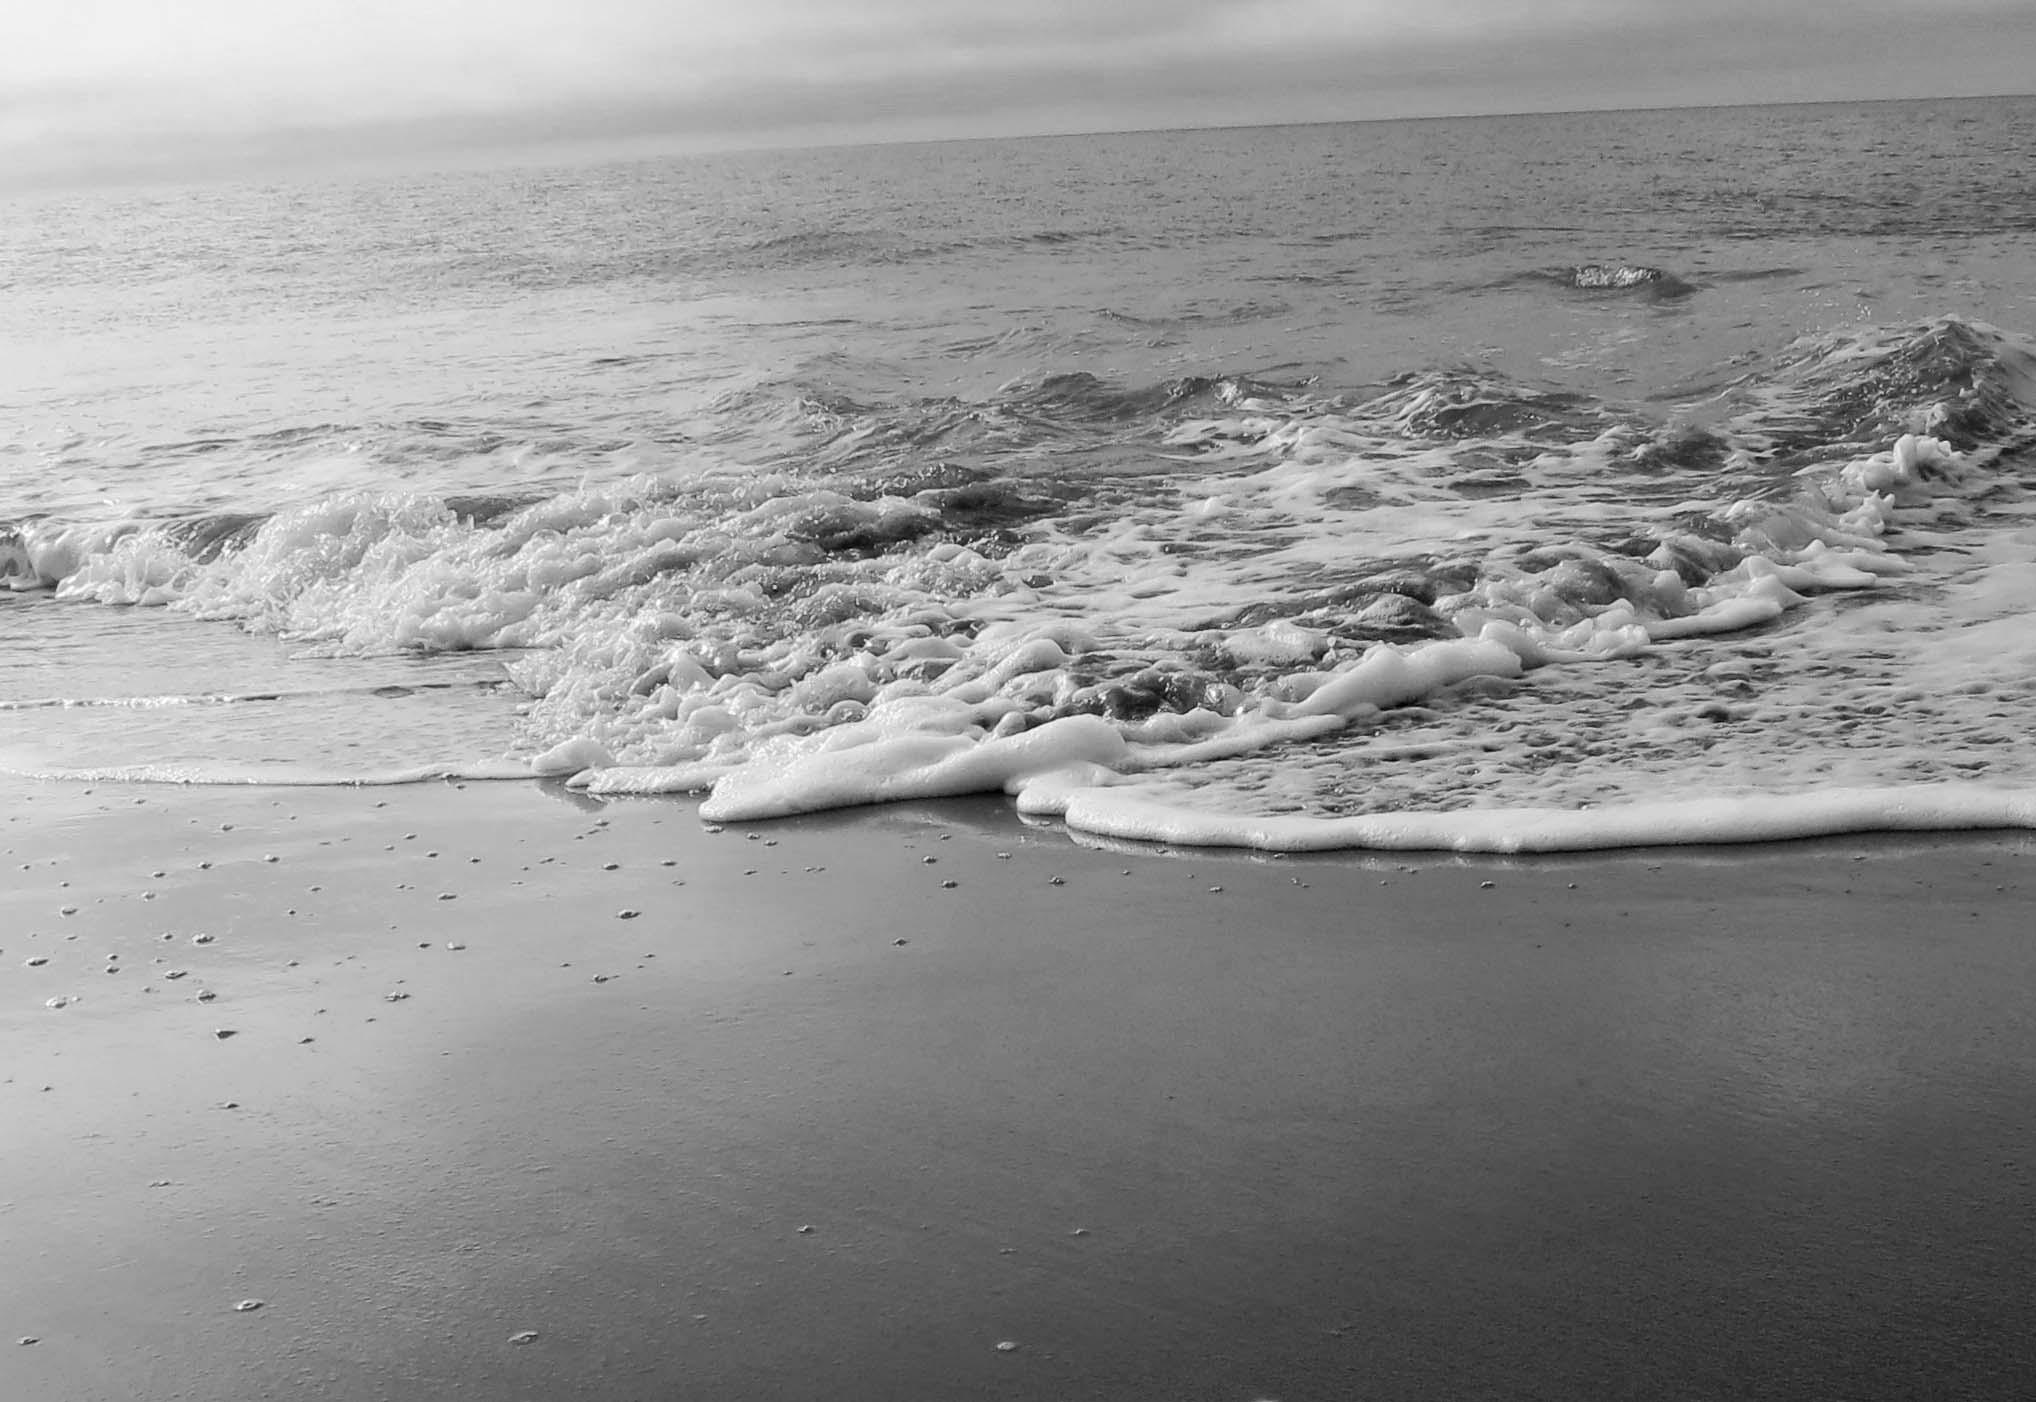 Gentle waves visit Limantour Beach at Pt. Reyes National Seashore. Photo by Curtis Mekemson.